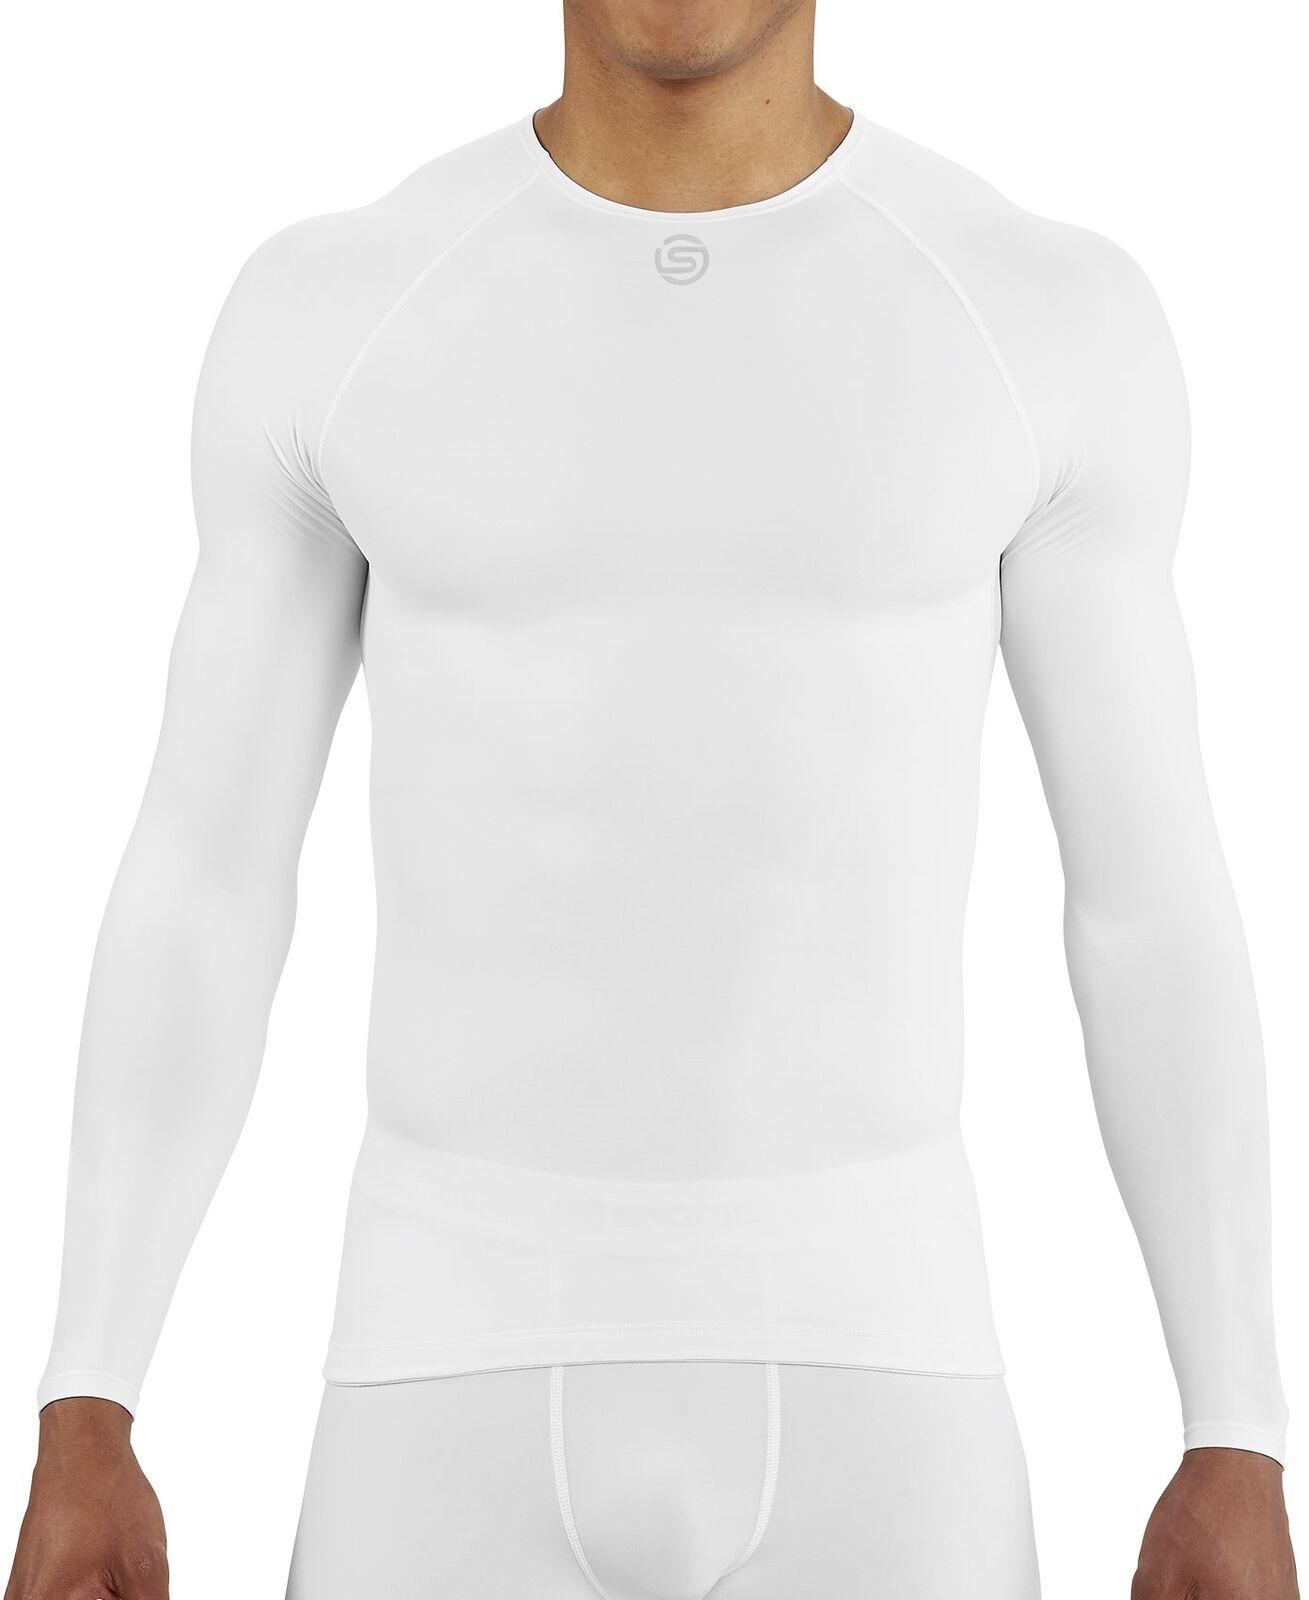 SKINS DNAmic Team Long Sleeve Mens Thermal Training Top - White